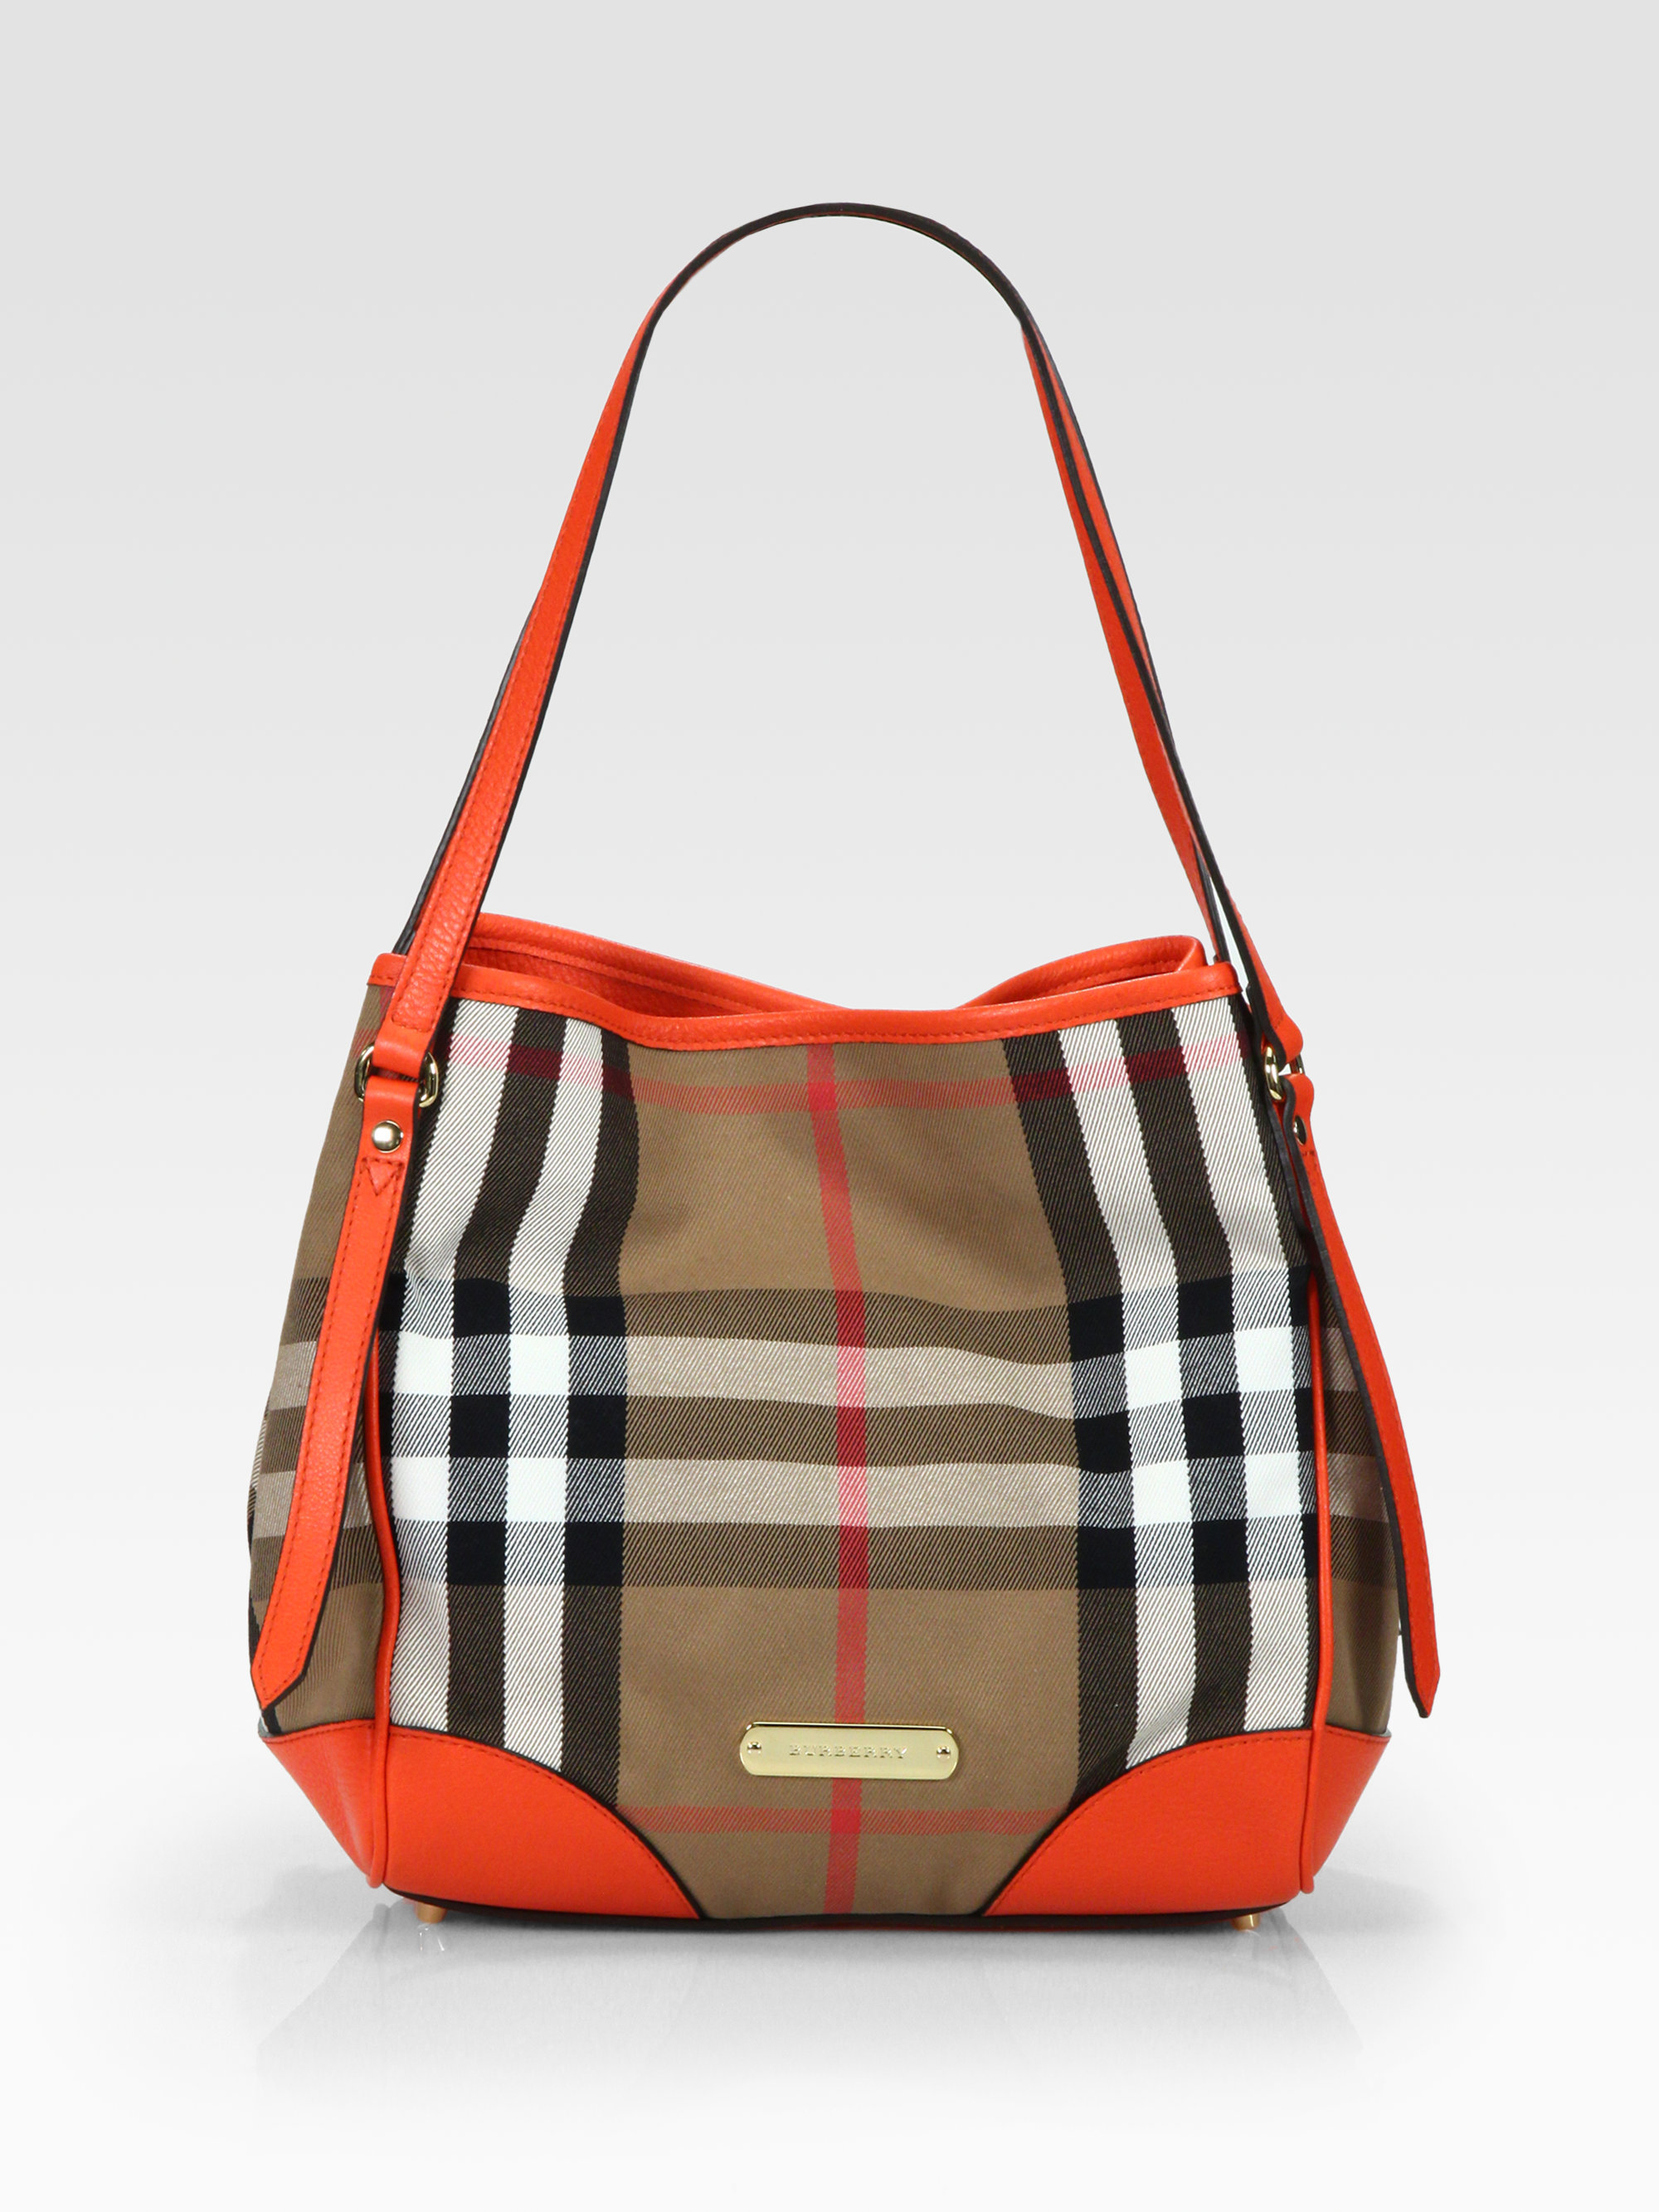 Burberry Bag Orange